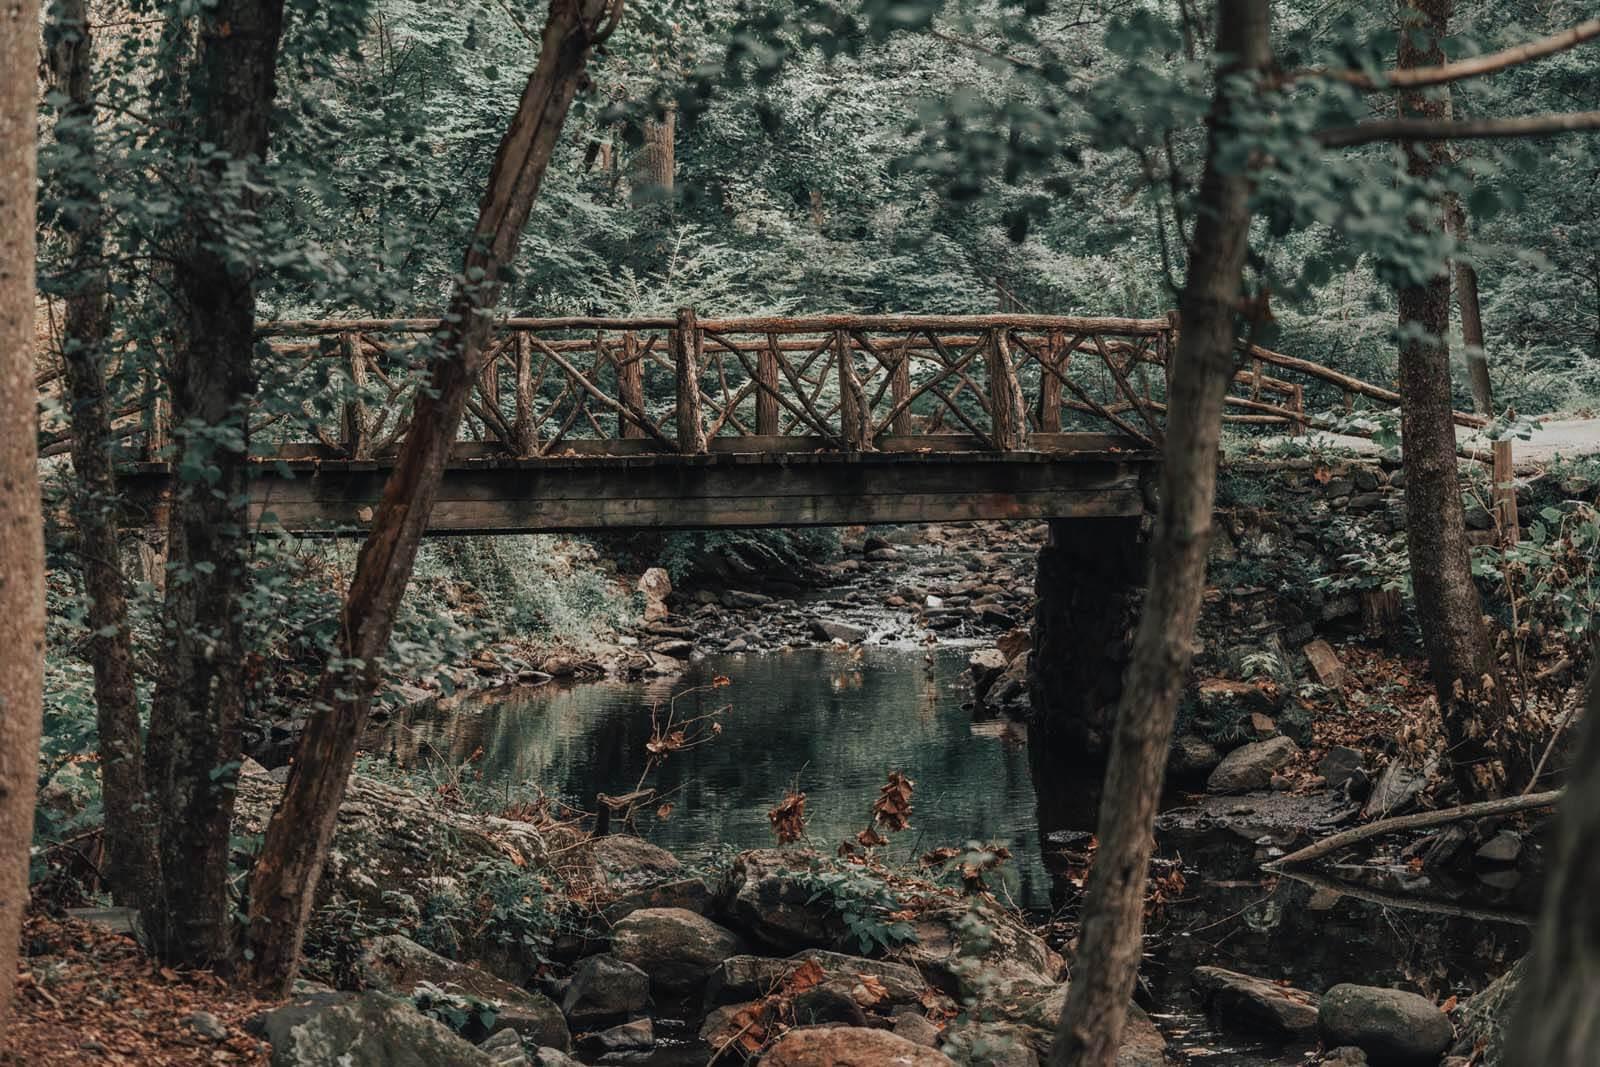 The wooden headless horseman bridge in the Sleepy Hollow cemetery in NY